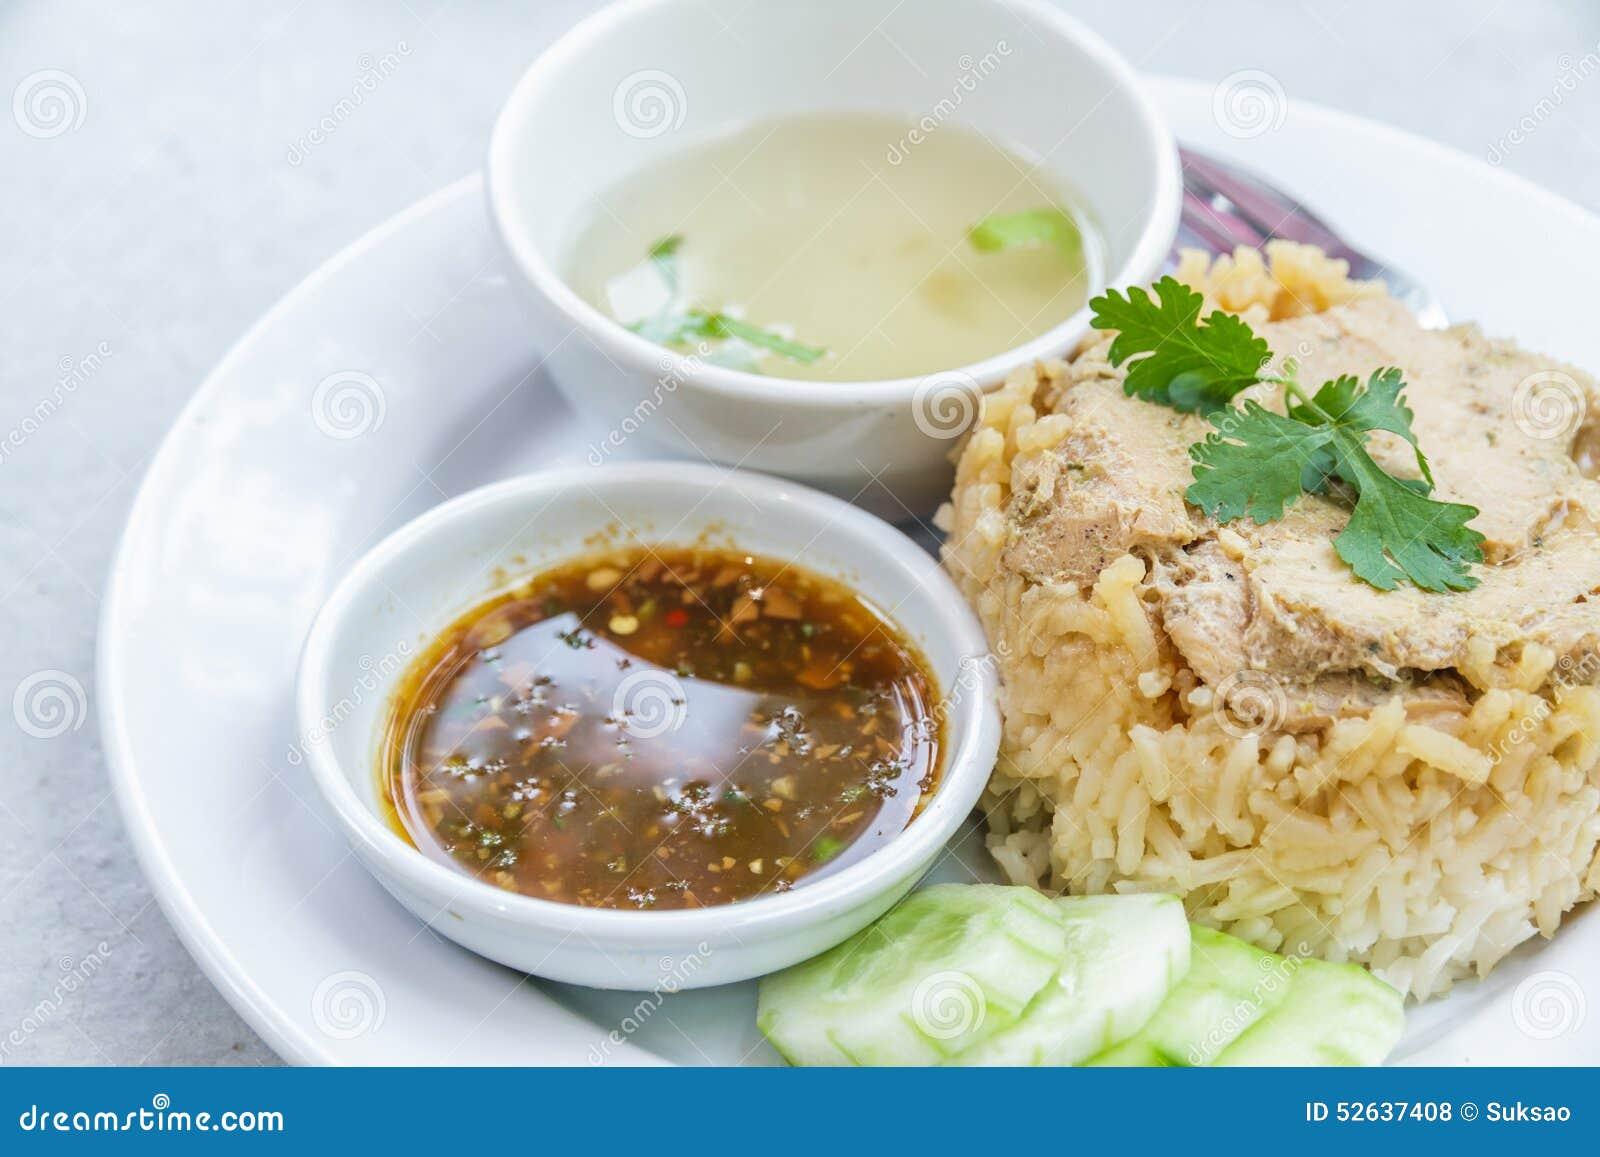 Rice roast chicken